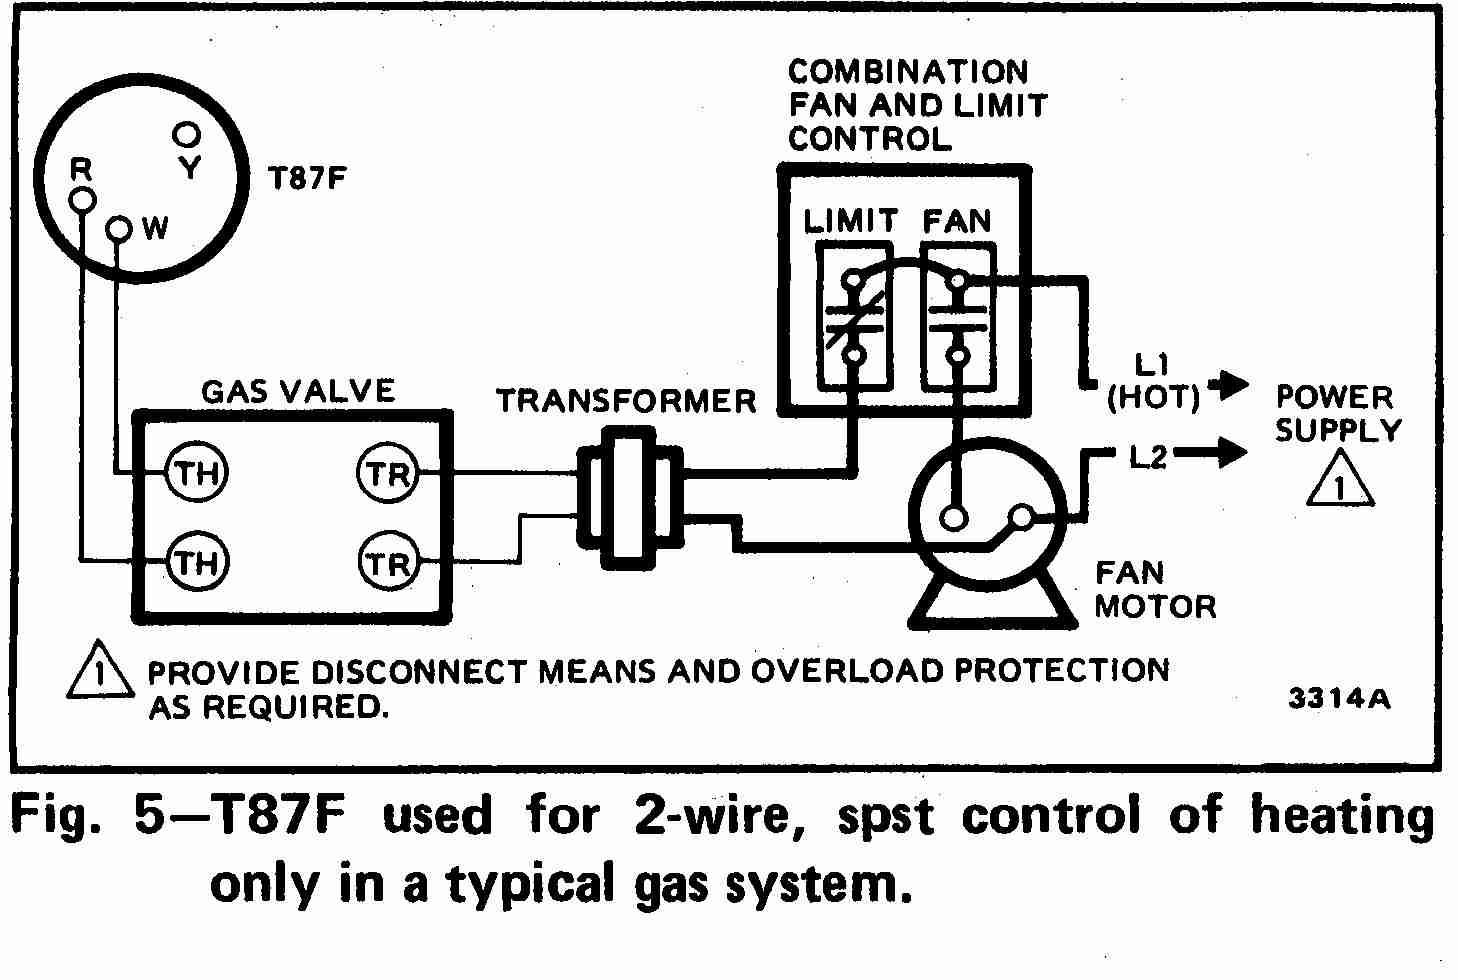 TT_T87F_0002_2Wg_DJF?resize=665%2C447 totaline thermostat wiring diagram p474 wiring diagram totaline thermostat p474-1010 wiring diagram at gsmportal.co